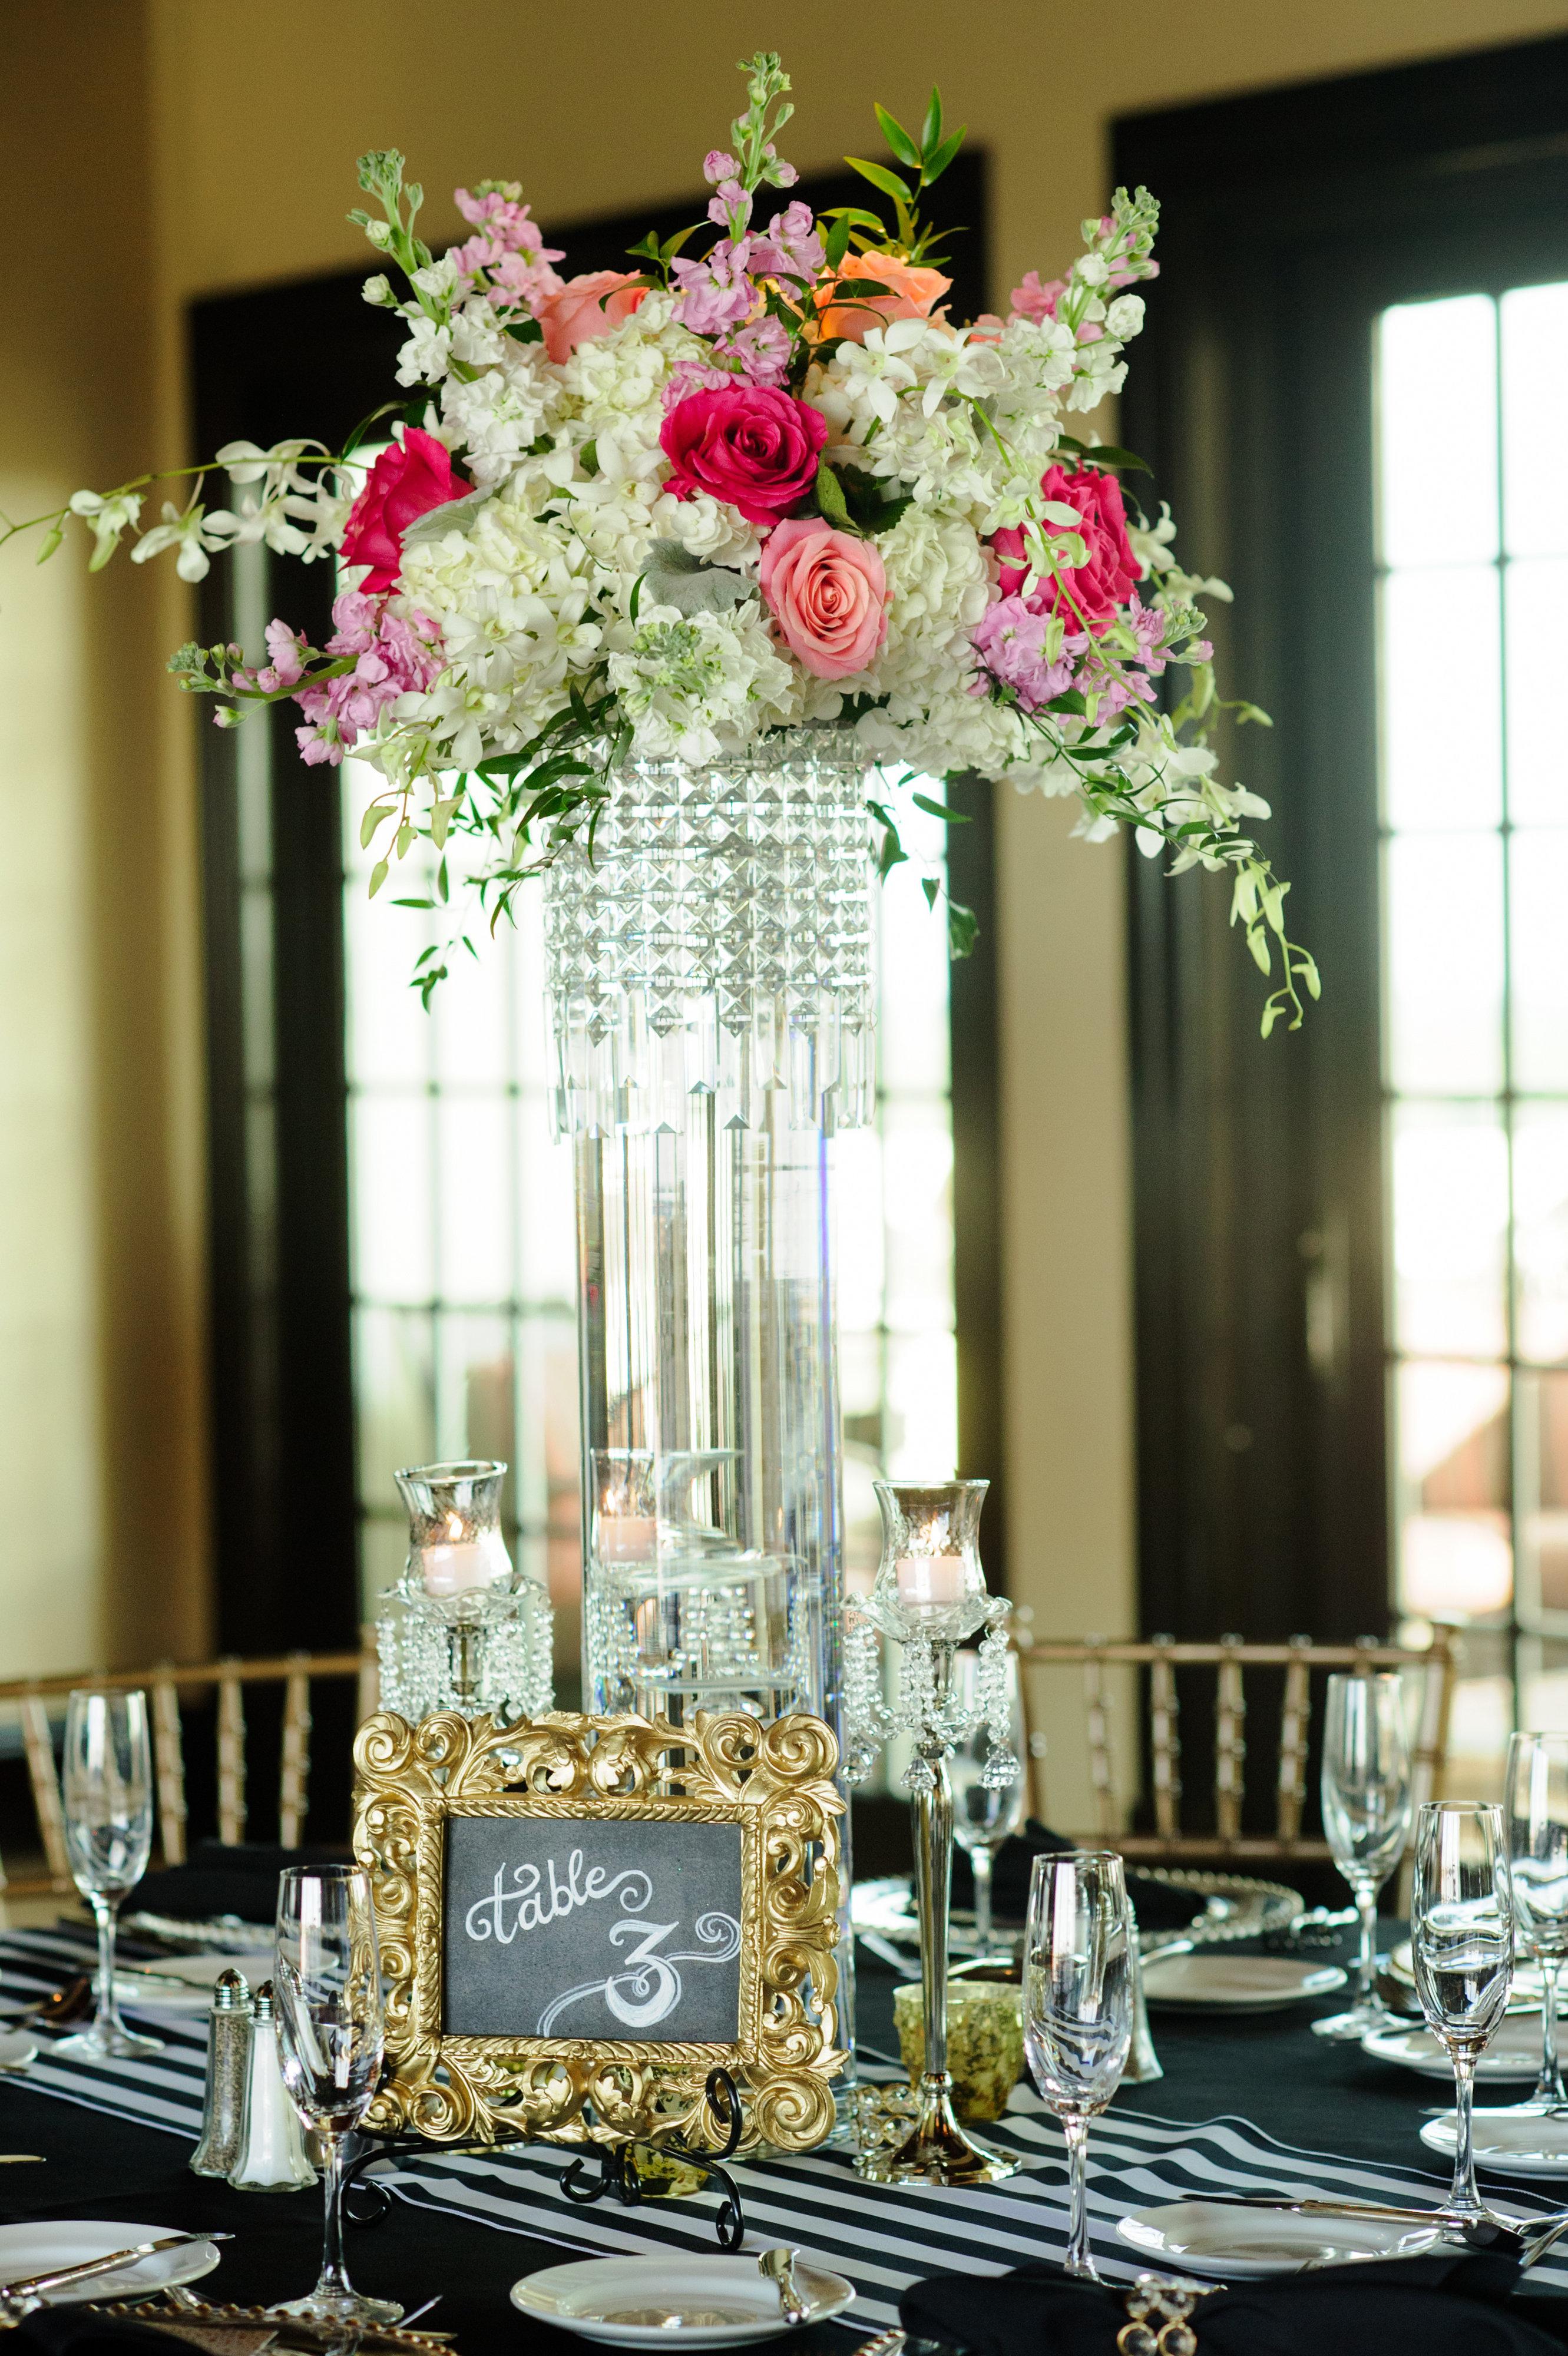 Orlando Wedding Amp Retail Floral Blog Page 5